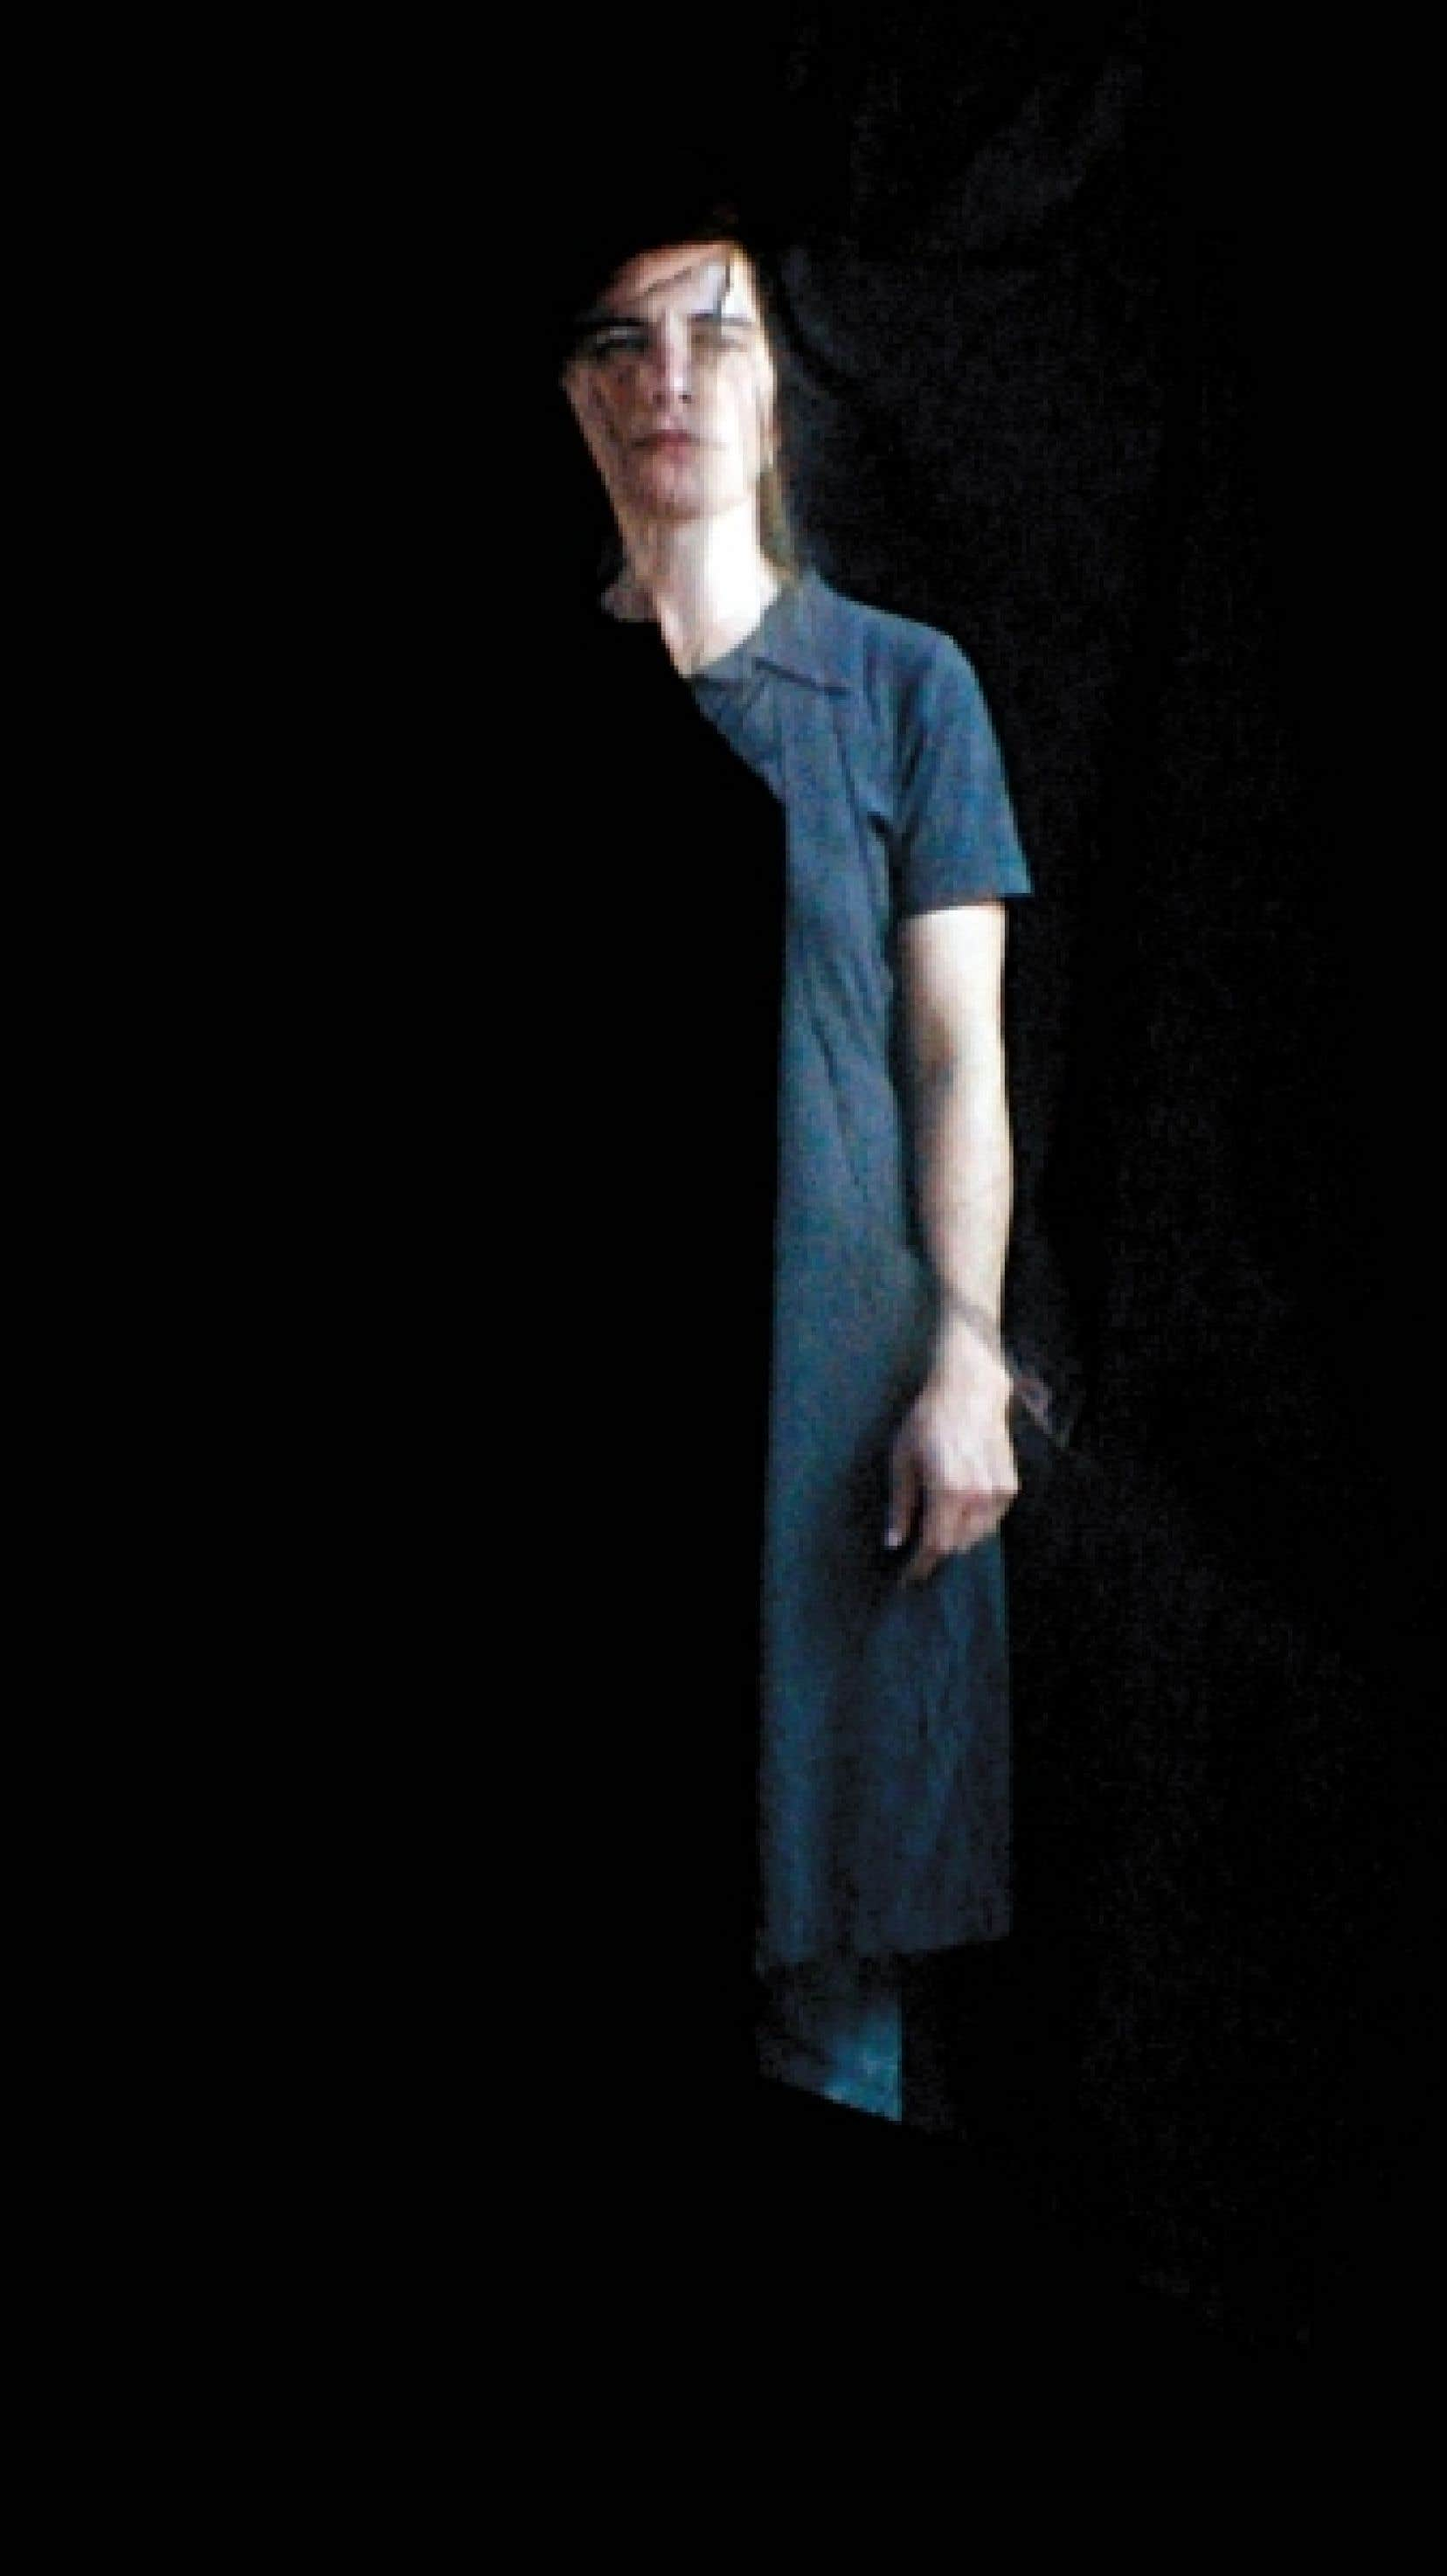 Fiona Tan, Projection, 2010, projection vidéo<br />